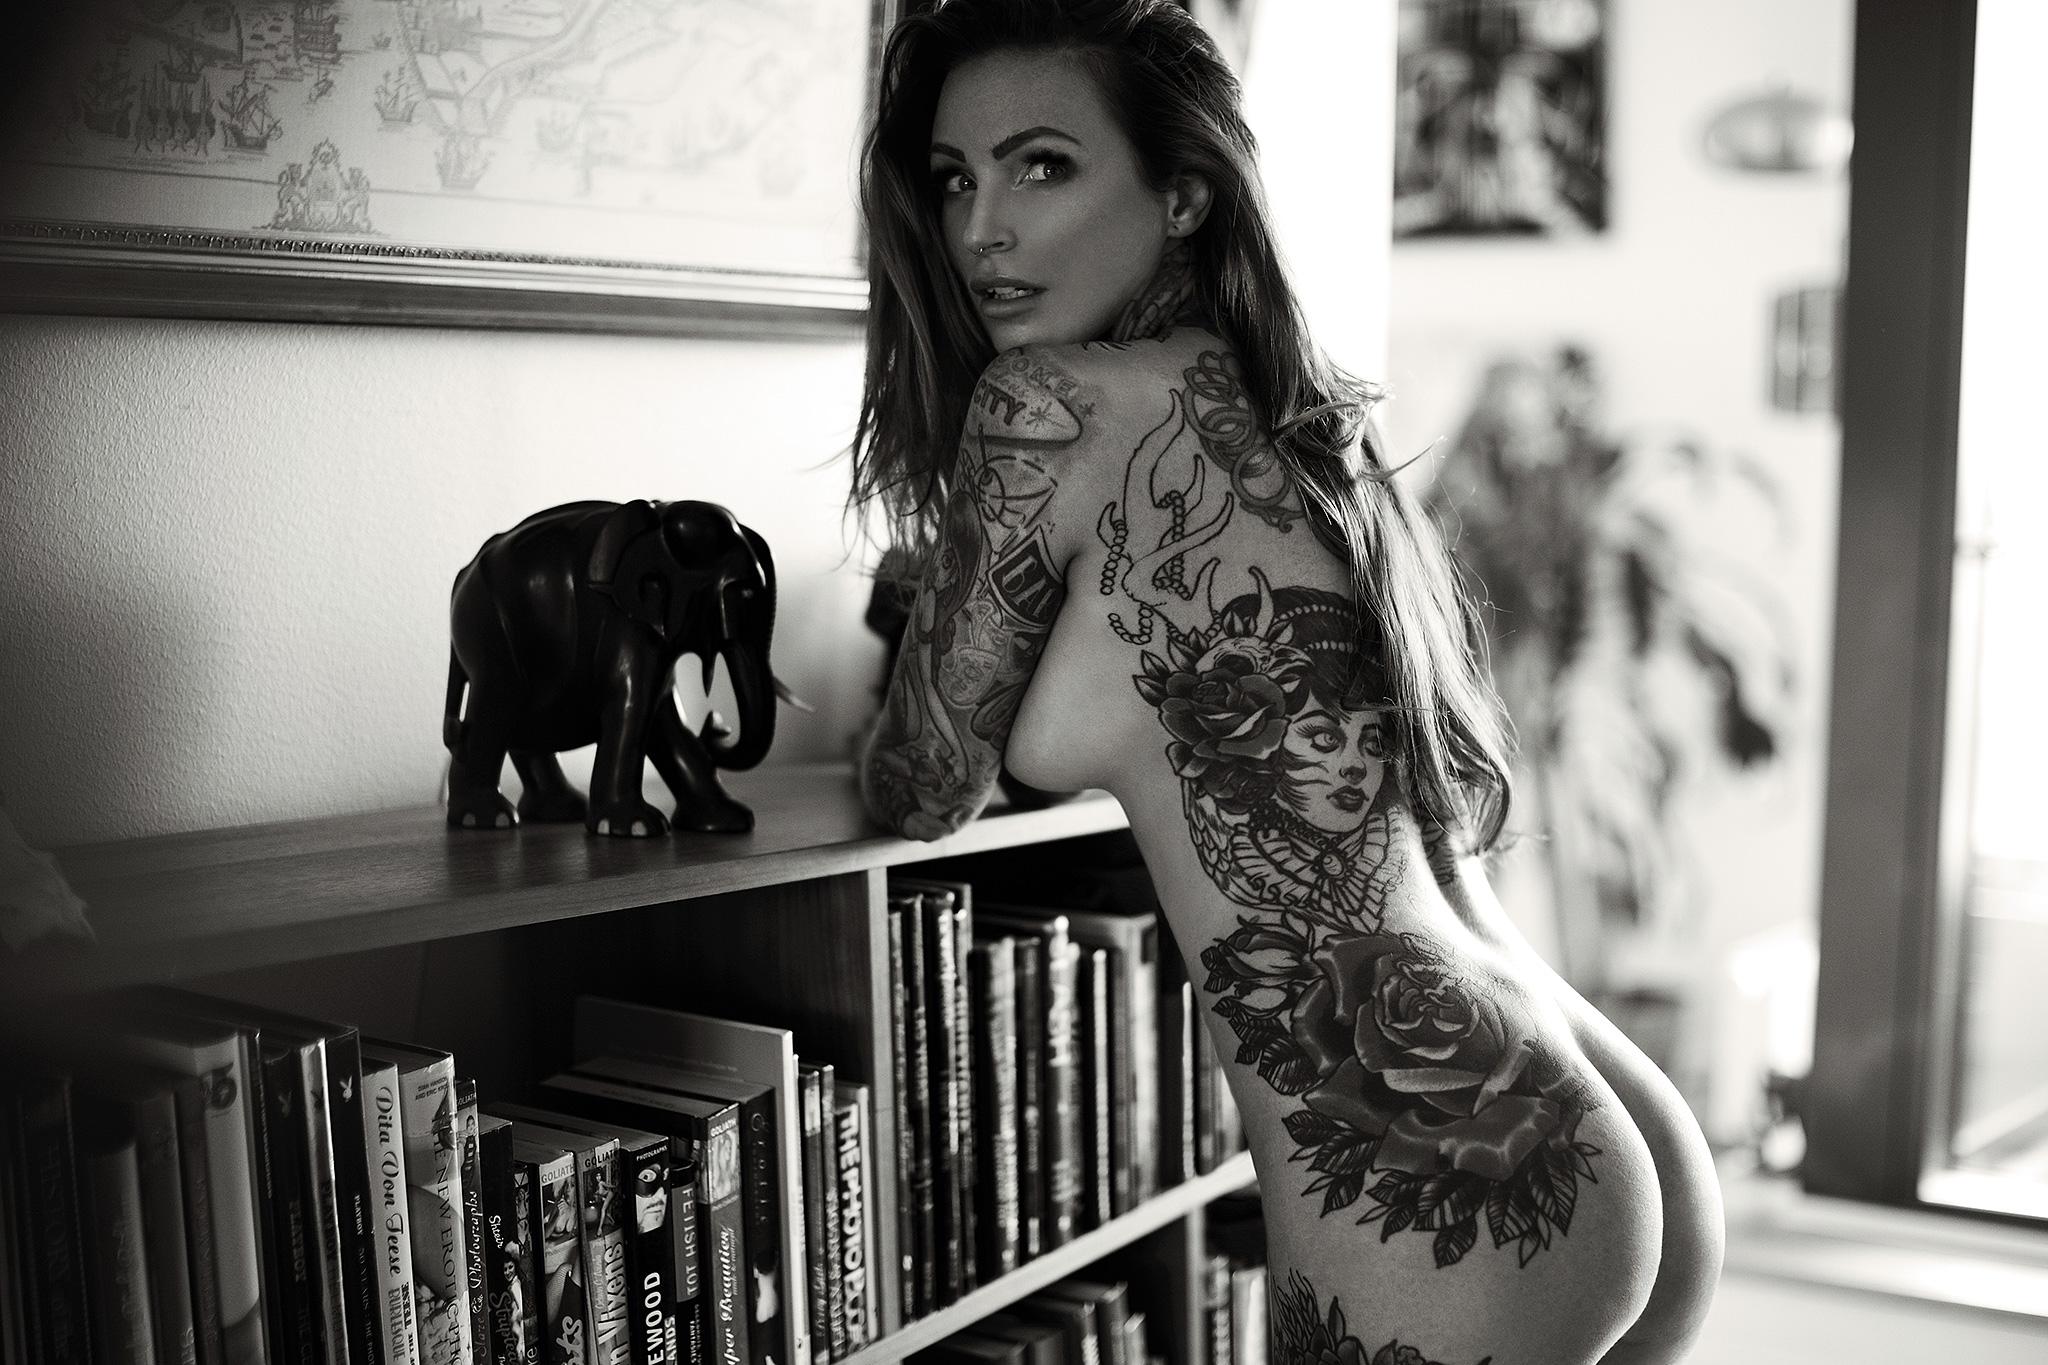 Mikkel_Laumann_Photography_Anne_Lindfjeld_Reroute_To_Remain_Photoshoot_Magazine_10.jpg